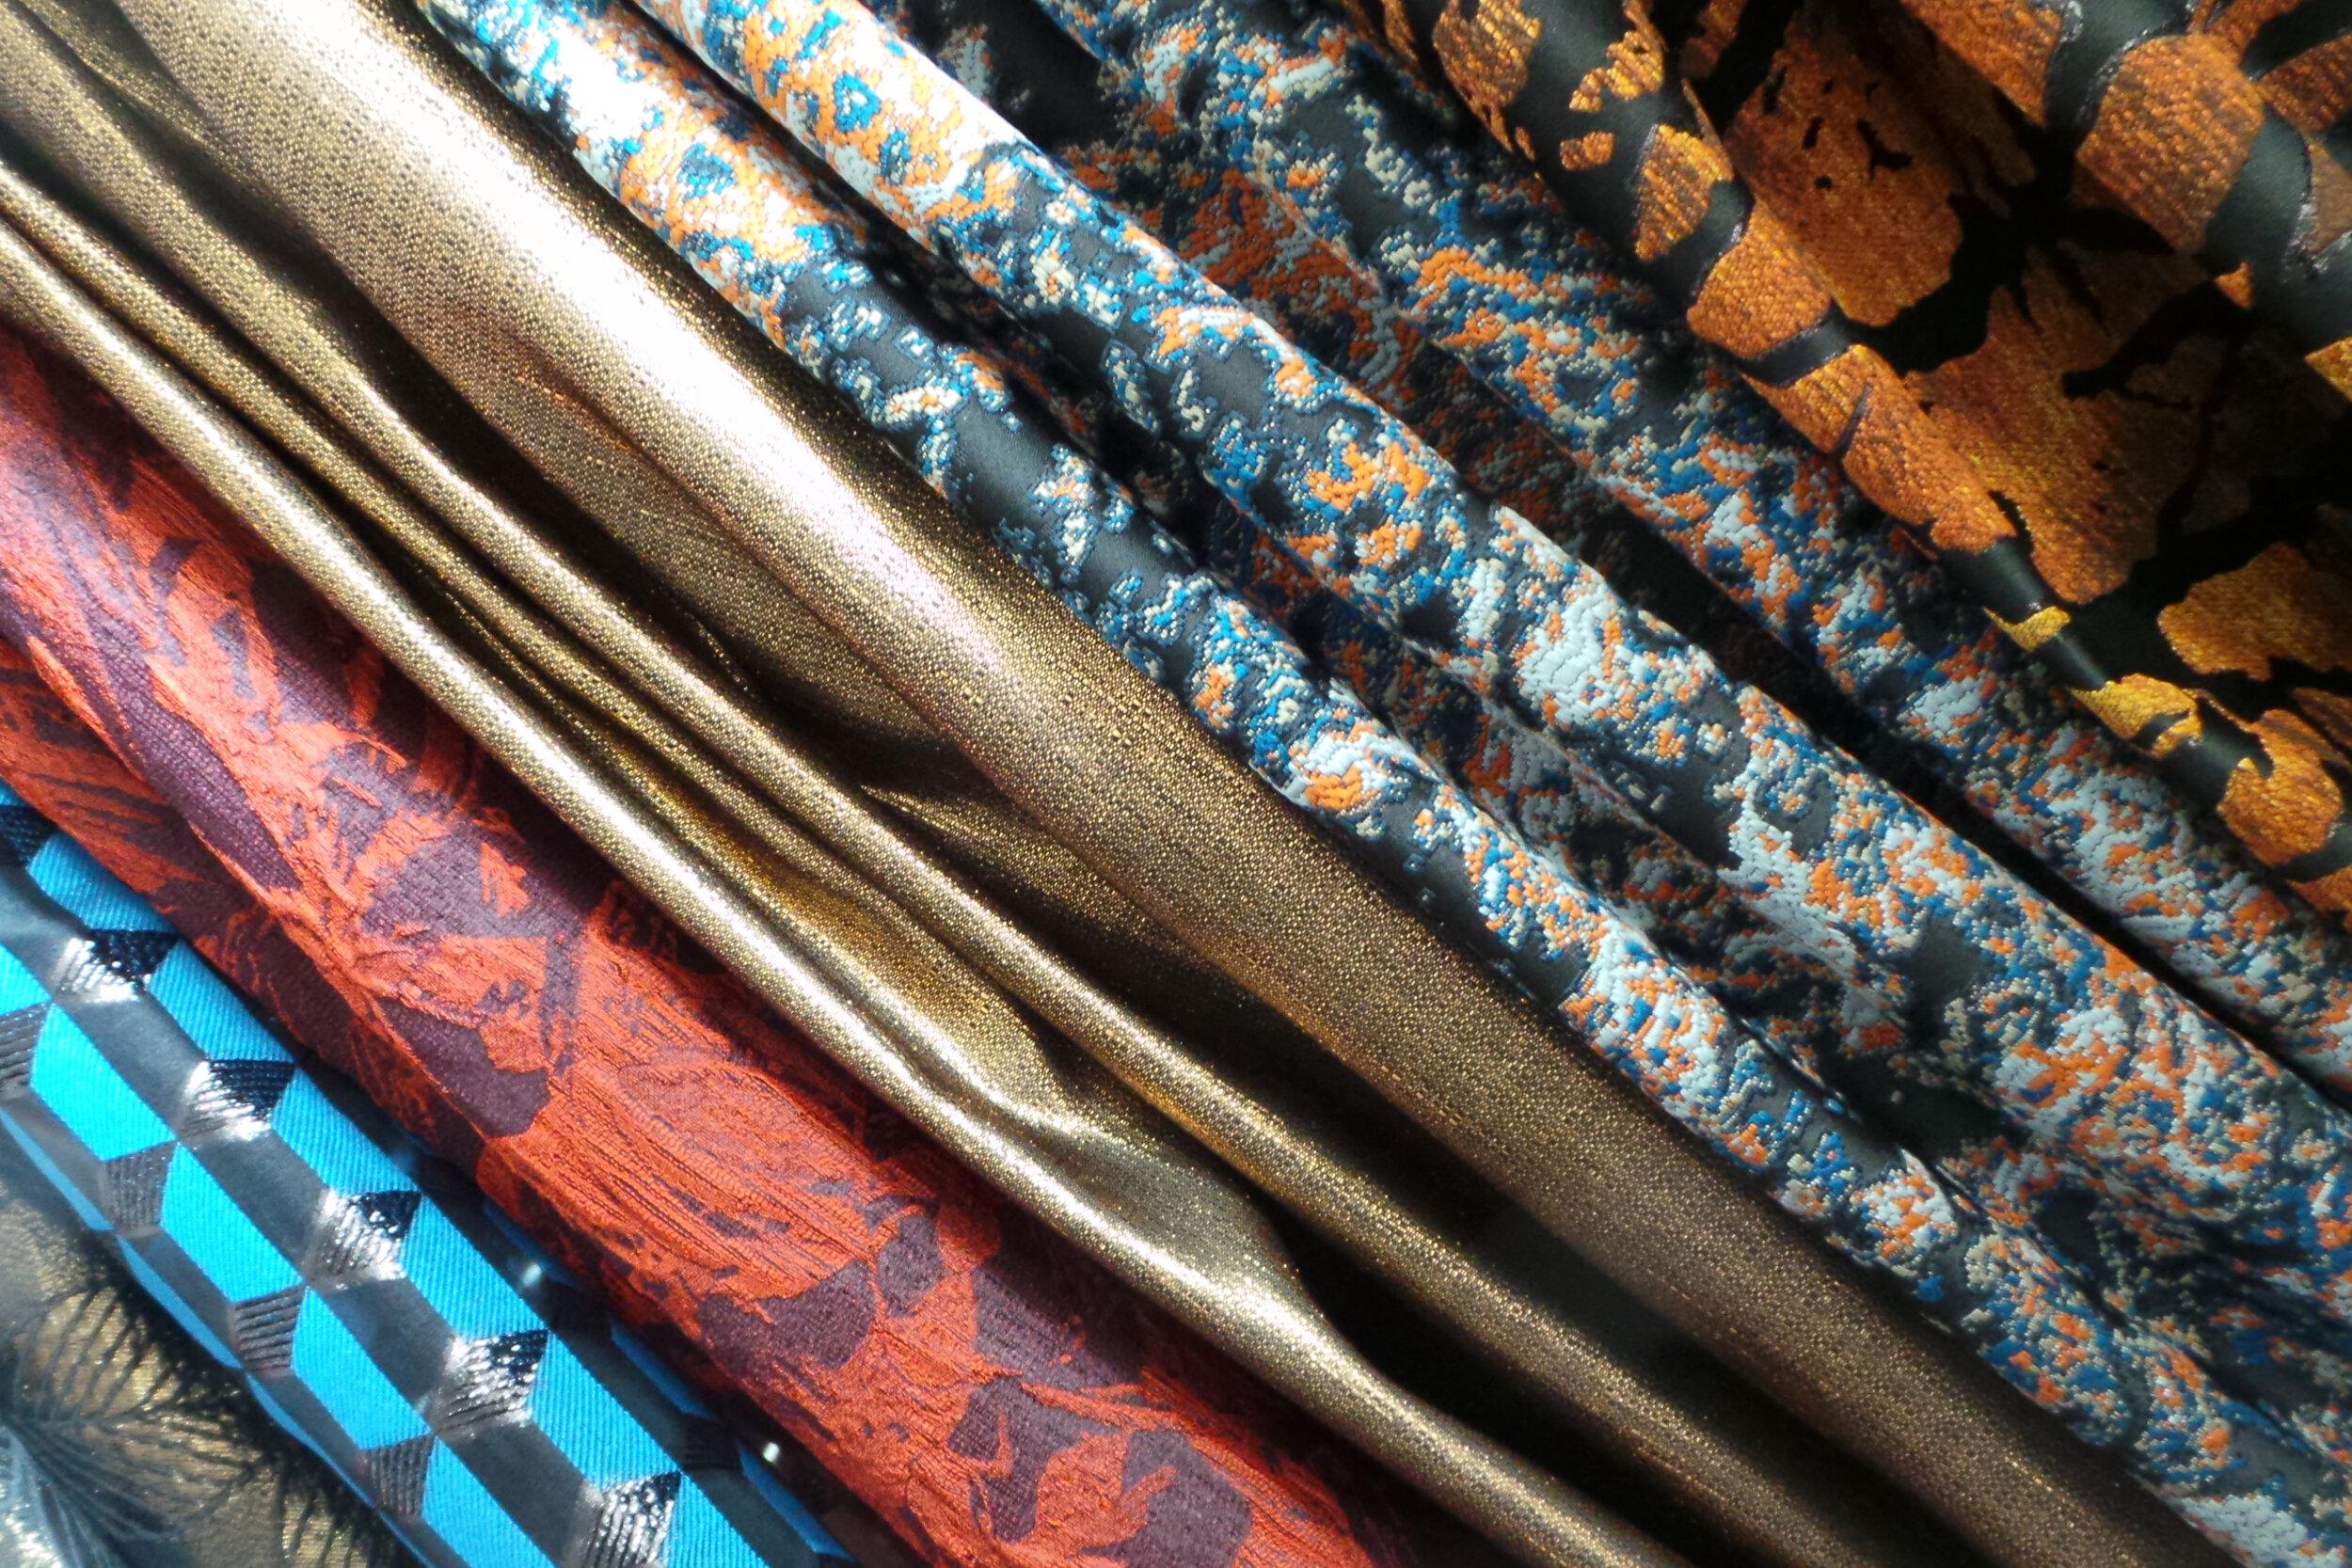 The Prestigo Collection - Our Famous Luxury Cloque and Jacquard range of Textiles.